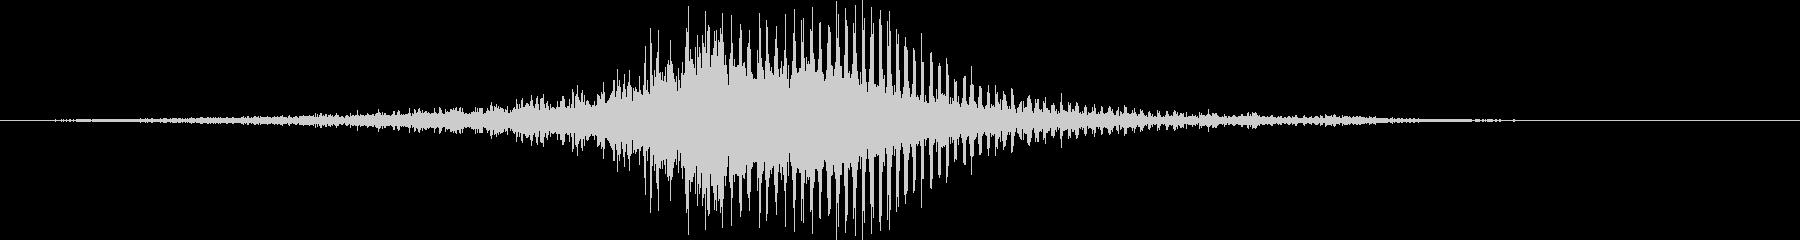 Model-t、By;離れた加速で...の未再生の波形